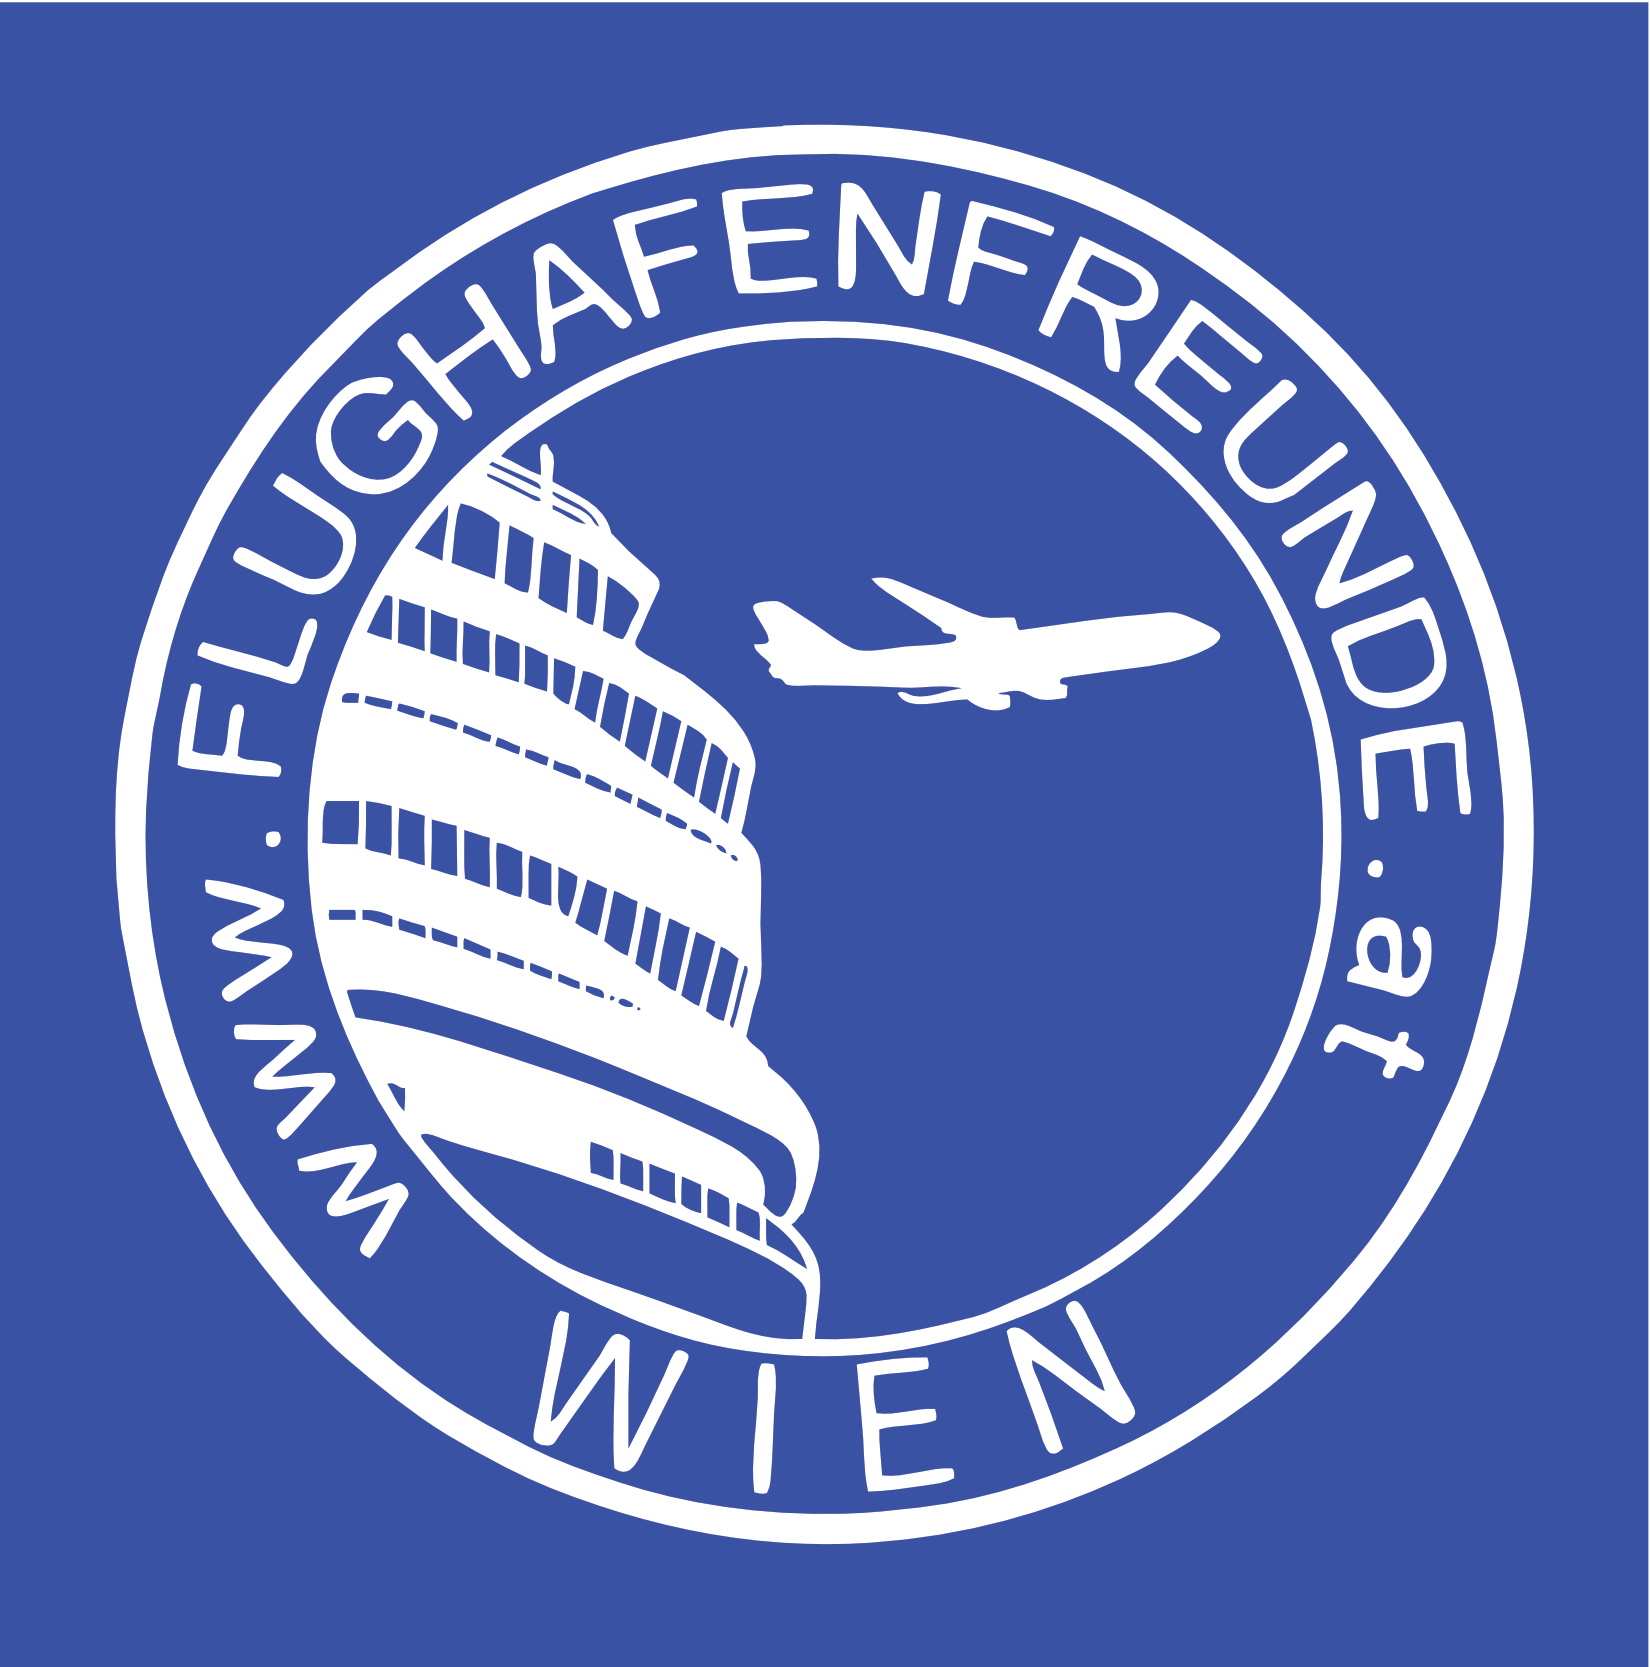 Flughafenfreunde Wien